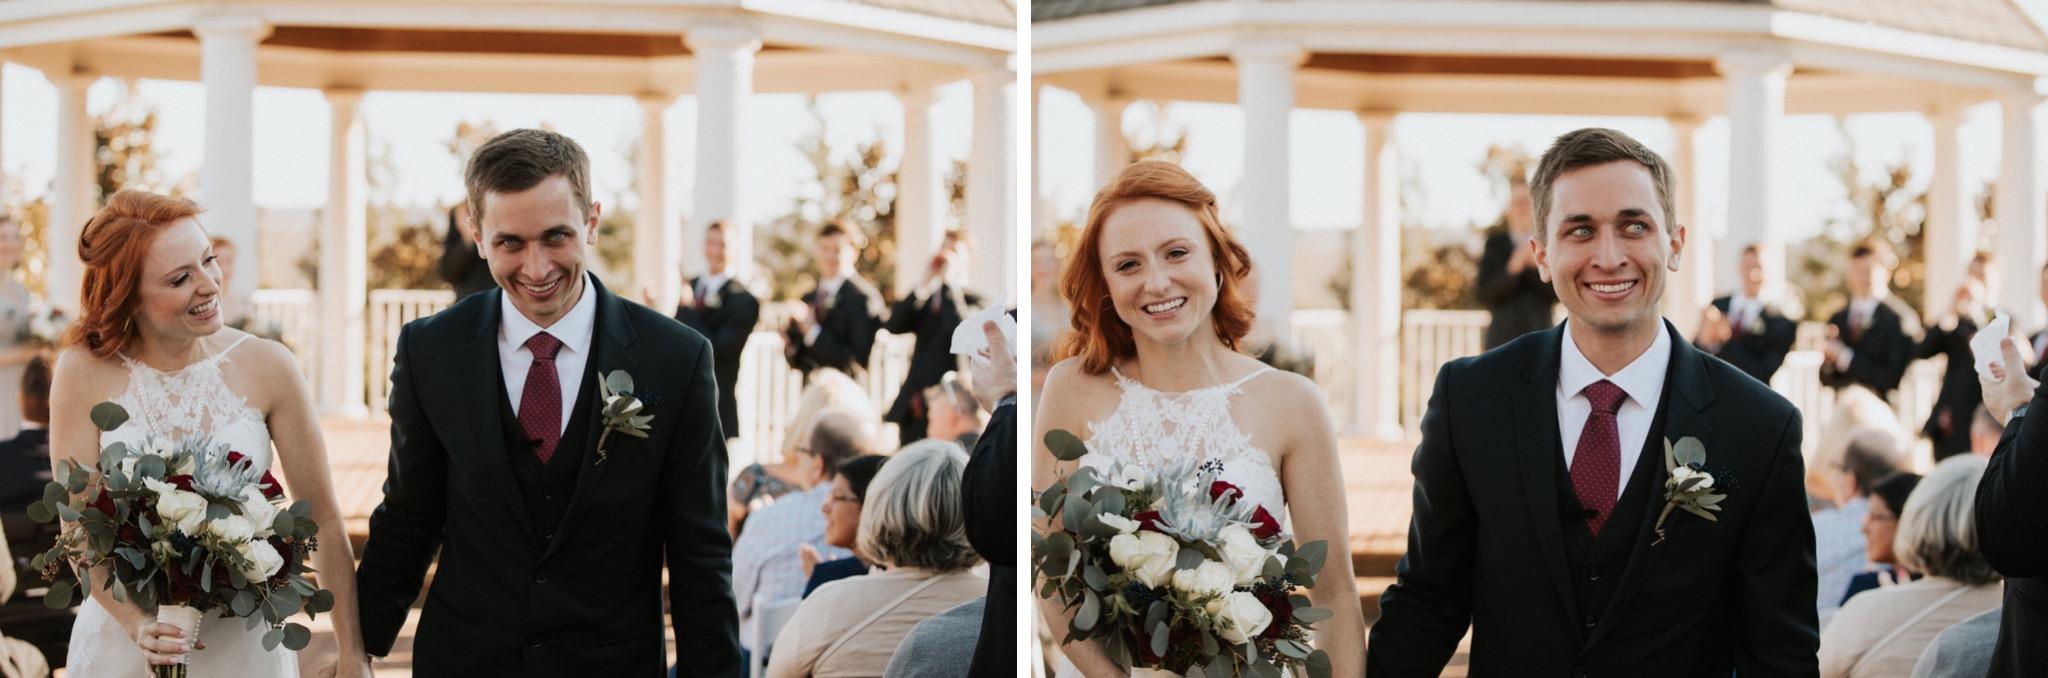 53_West Manor Estate Weddings - Pat Cori Photography-108_West Manor Estate Weddings - Pat Cori Photography-109_Ceremony_PatCoriPhotography_VirginiaWeddingPhotographer_WestManorEstate_Wedding.jpg